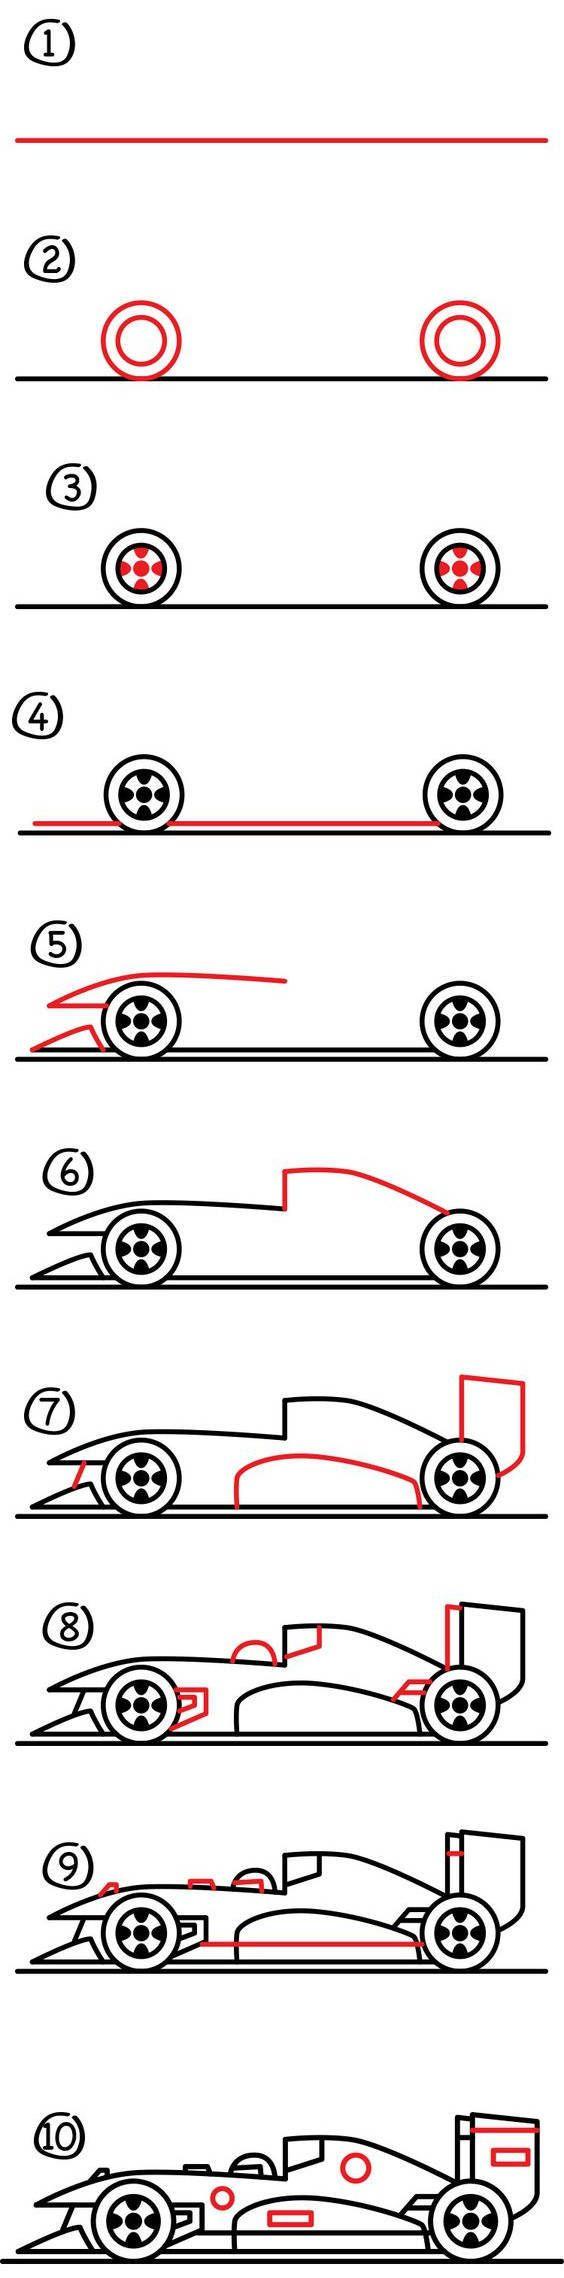 carros-a-lapiz-faciles-2